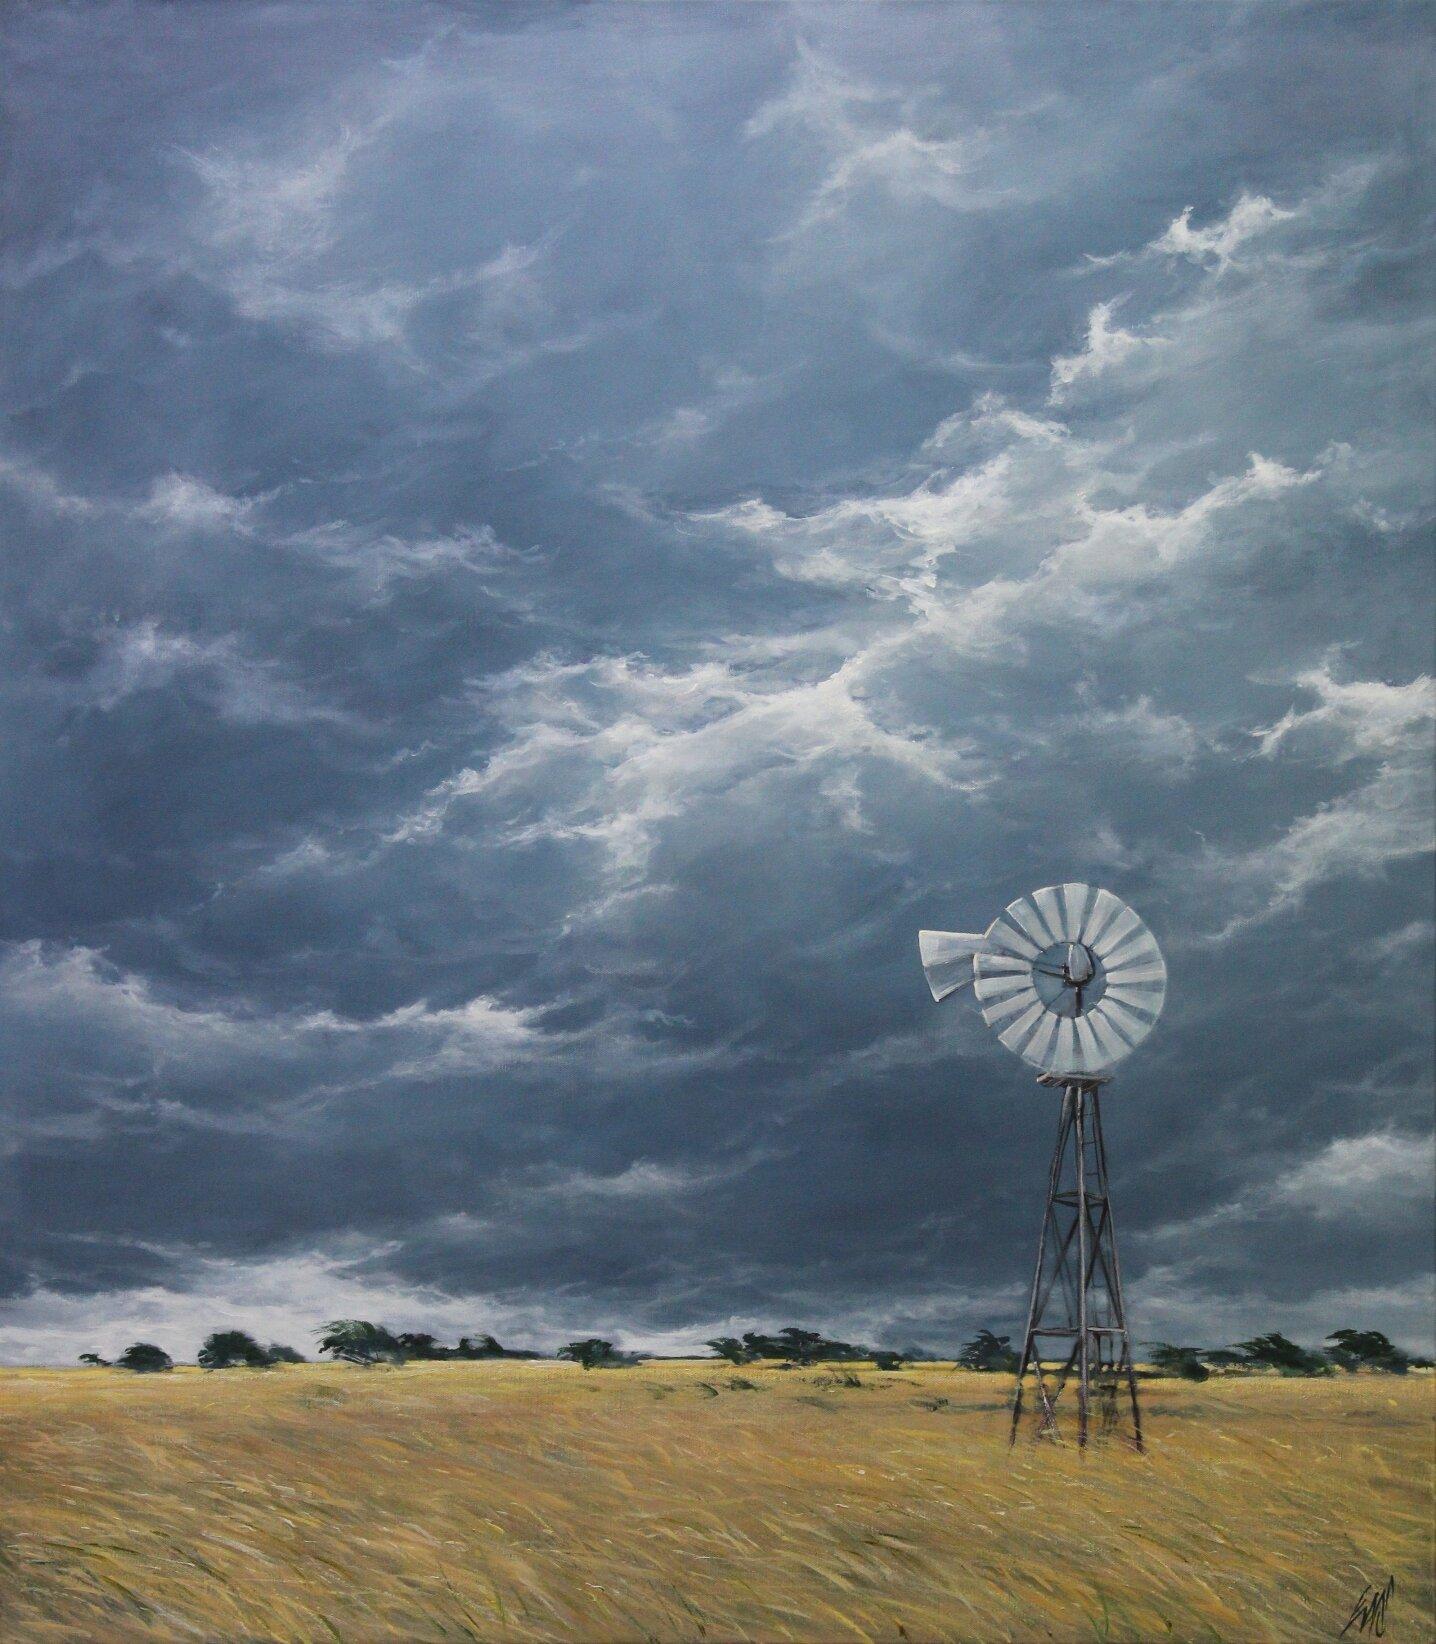 Paul EvansSummer Storm, 2019 Acrylic on Belgian Linen122 x 107 cm.jpg